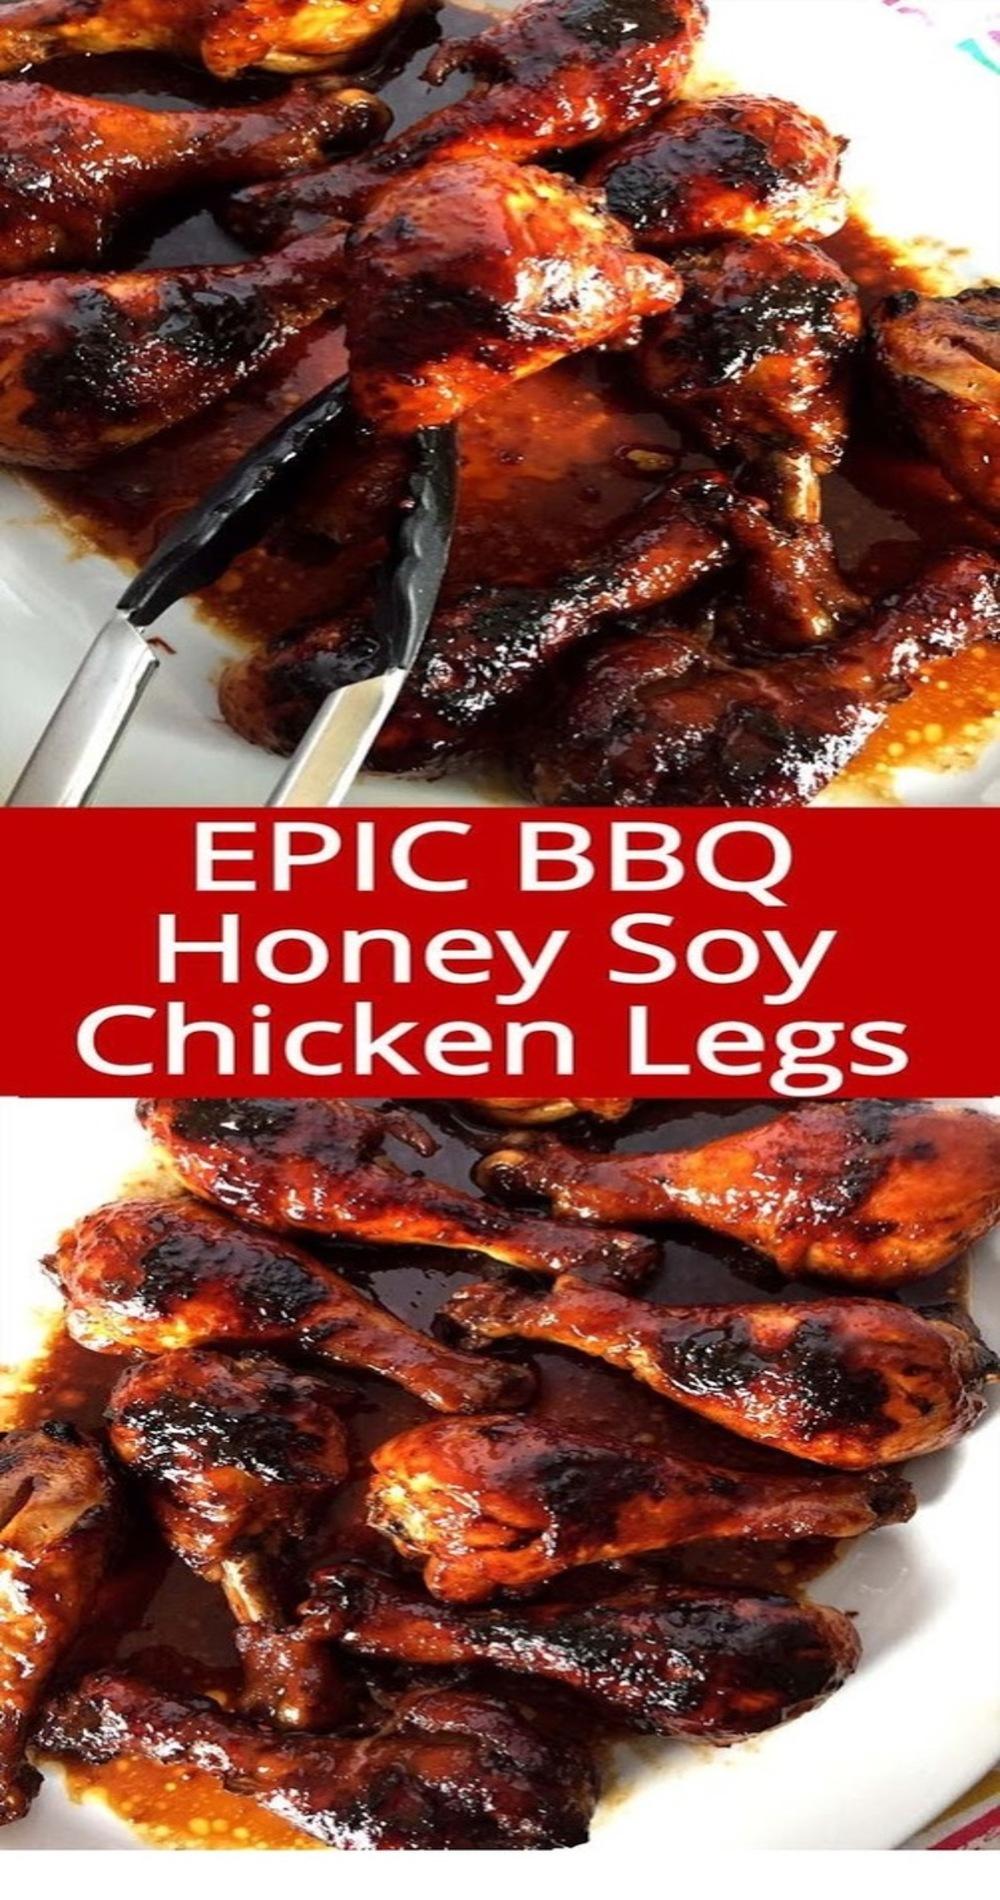 Honey Soy BBQ Baked Chicken Legs